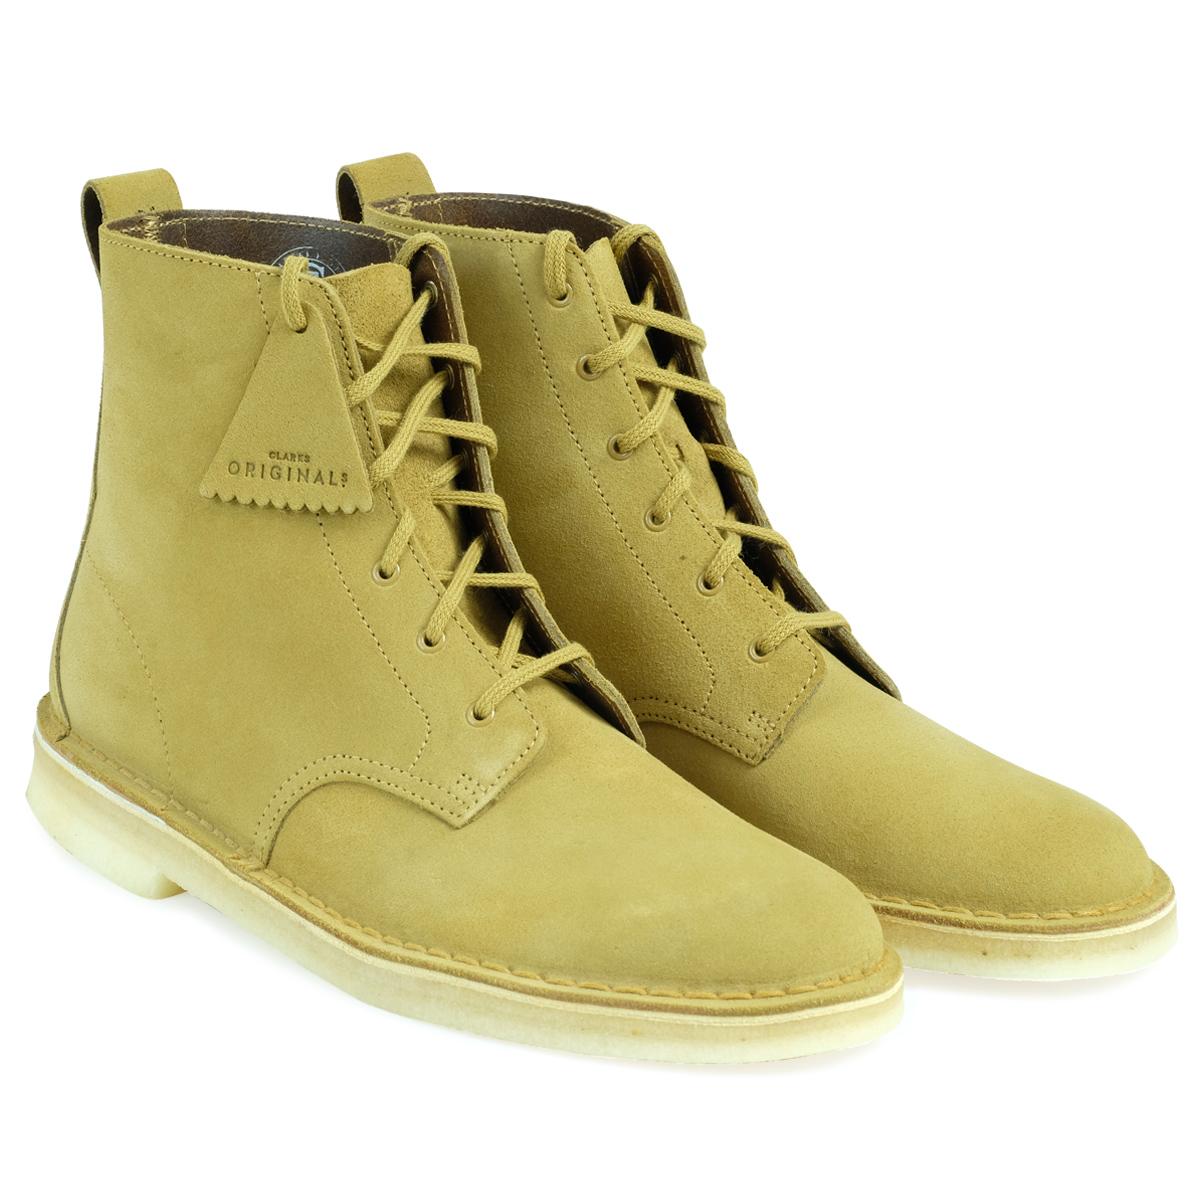 d221caa42be Clarks DESERT MALI kulaki dessert Mali boots men 26128271 shoes brown [1711]